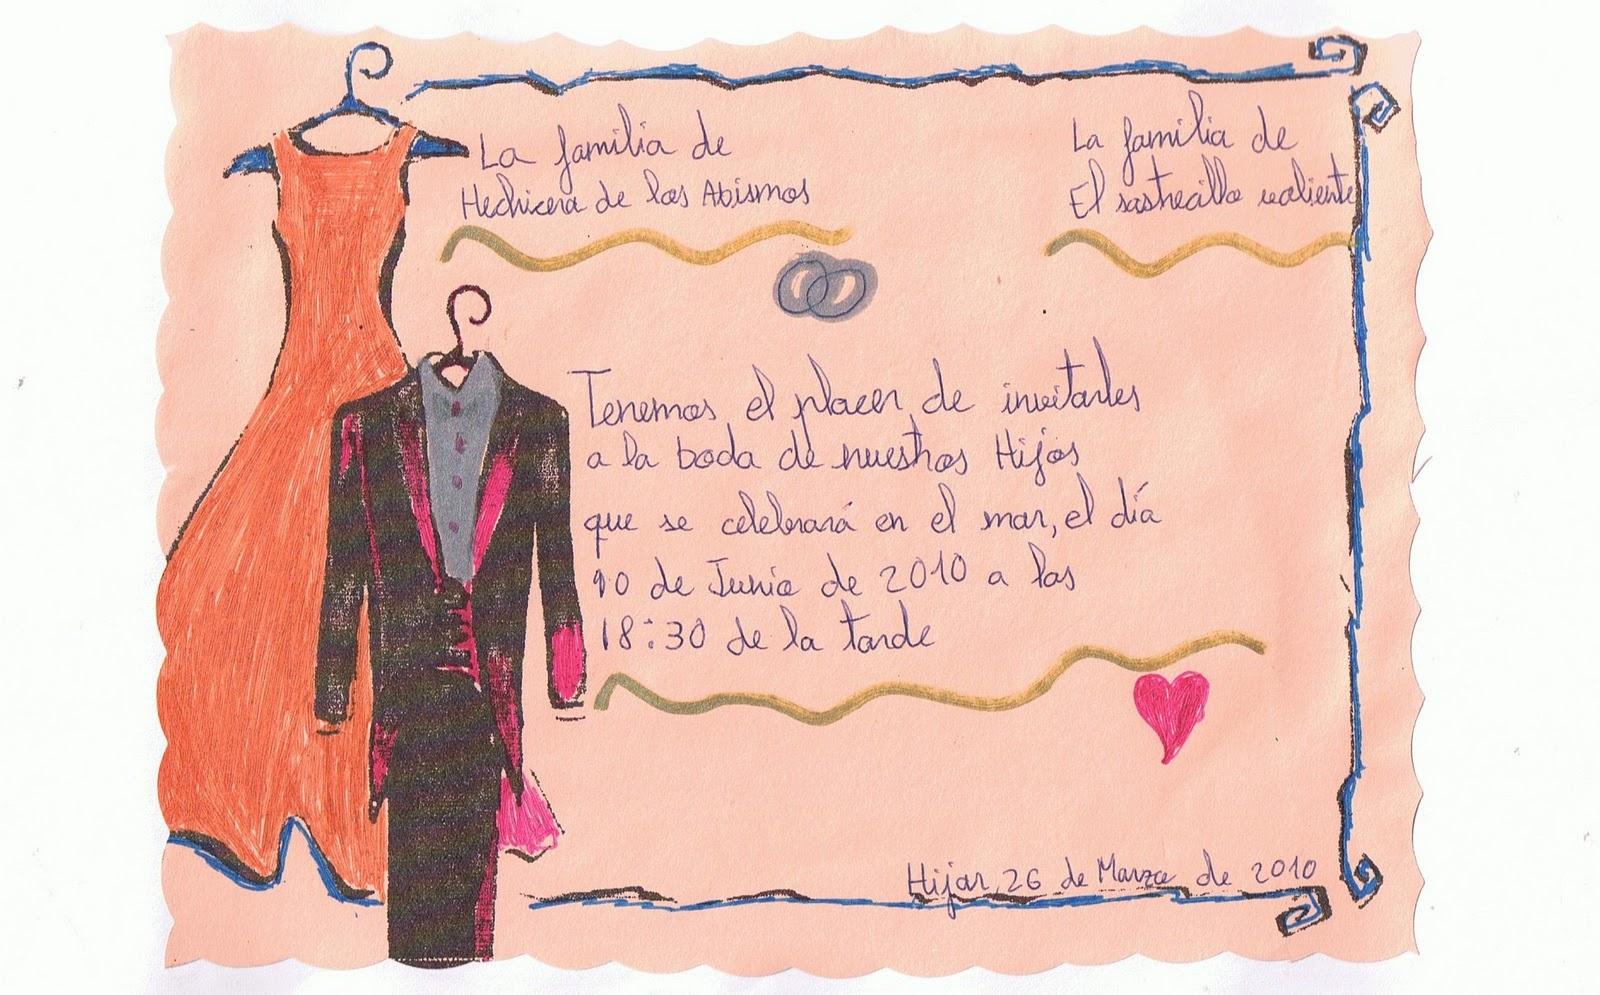 Invitaciones de boda texto cristiano - Tarjeta de boda ...